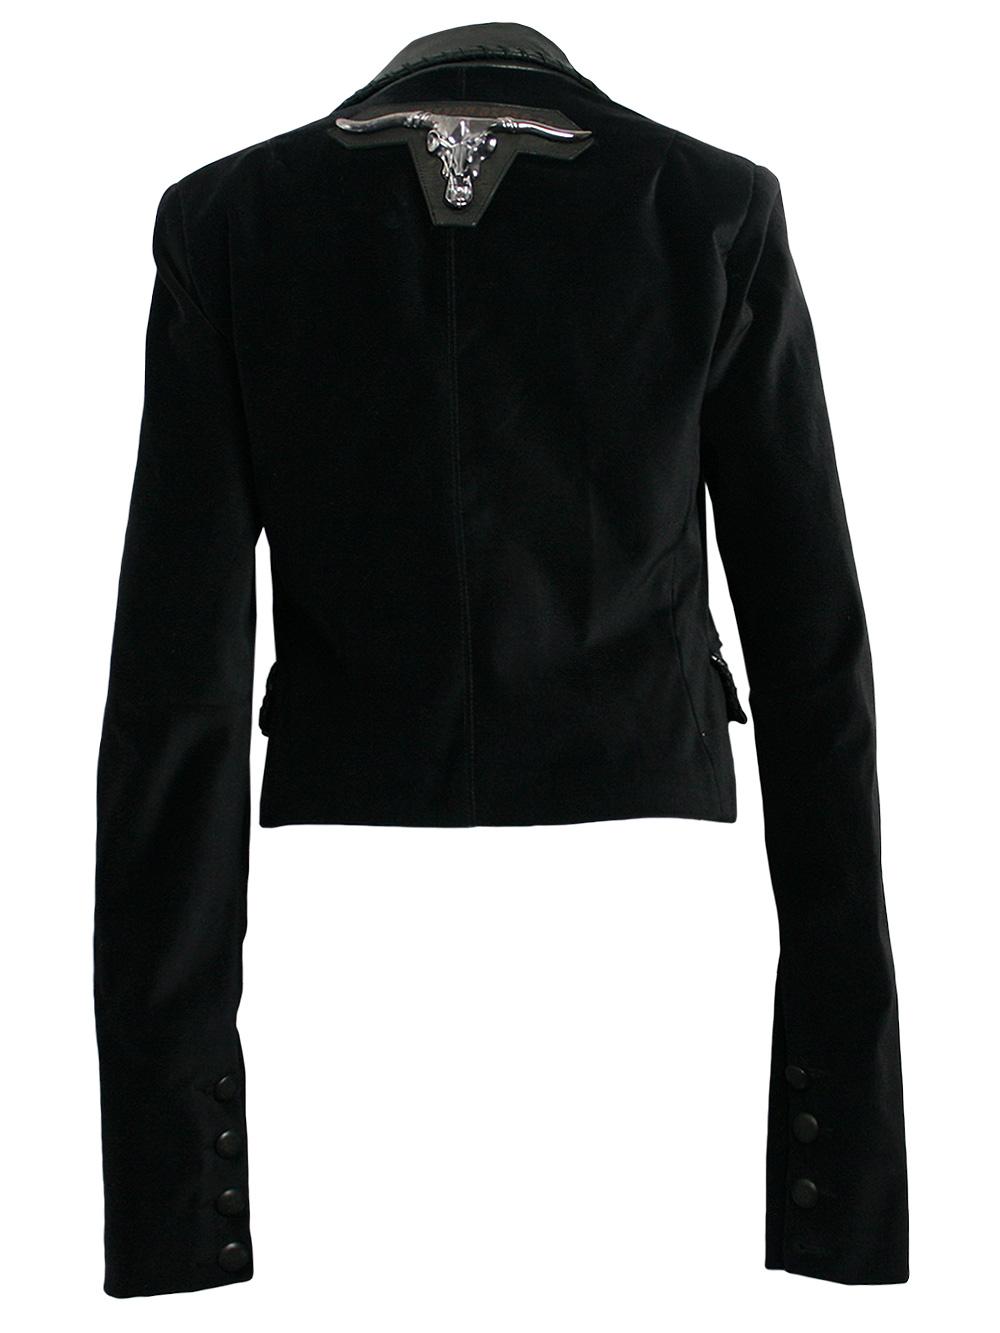 philipp plein damen blazer jacke in schwarz bull neu sehr edel gr l ebay. Black Bedroom Furniture Sets. Home Design Ideas